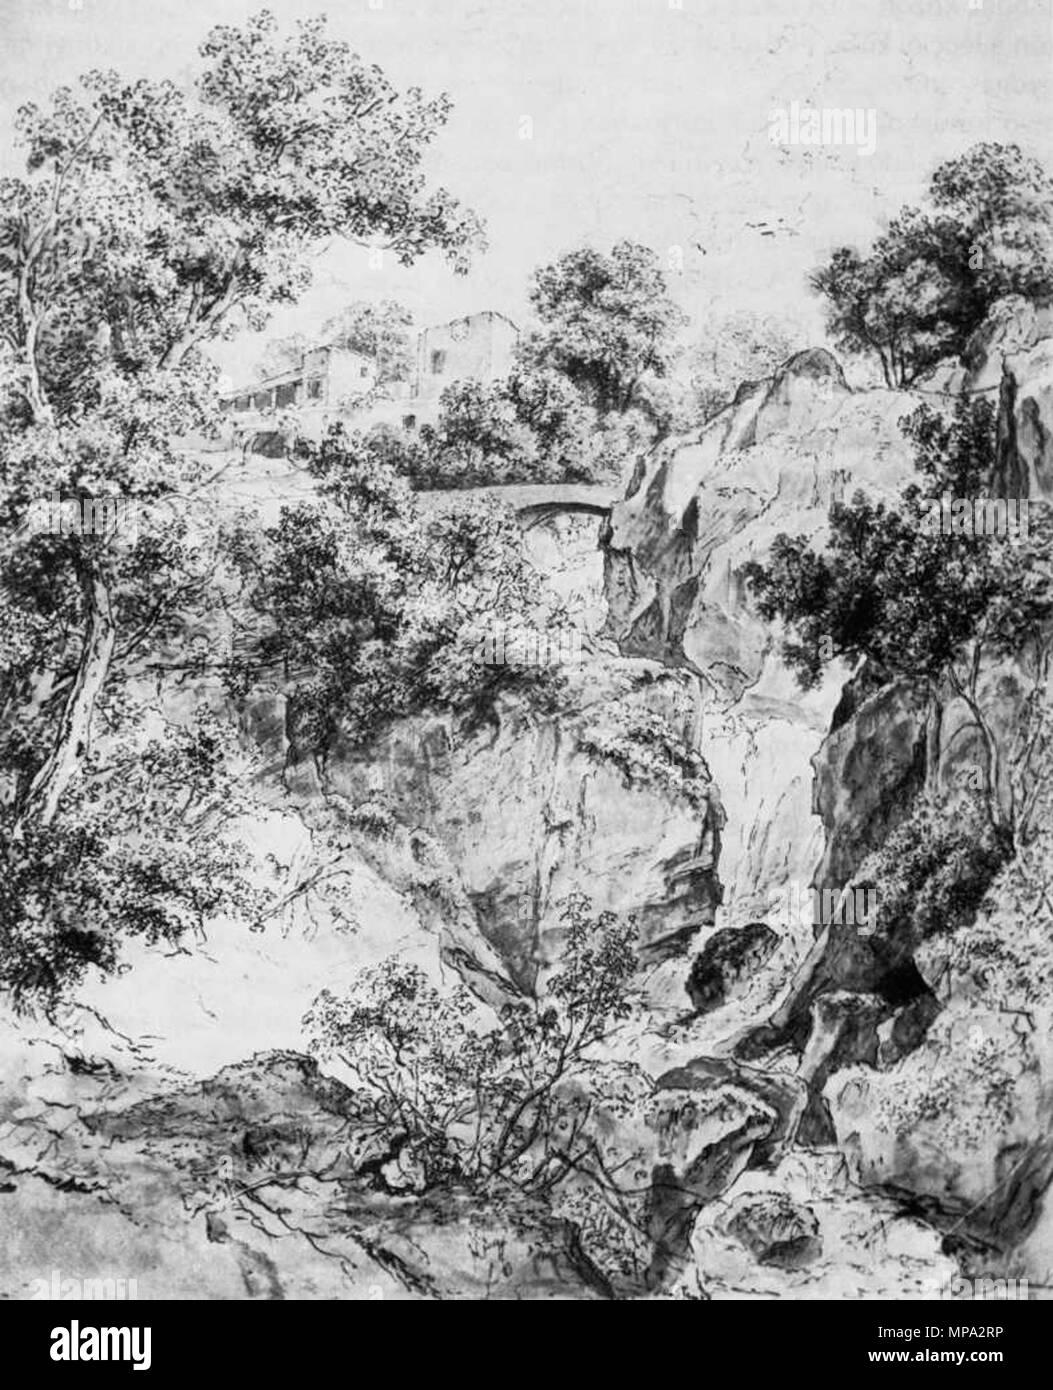 863 Markó, Károly - Landscape with Waterfall (ca1840) Stock Photo